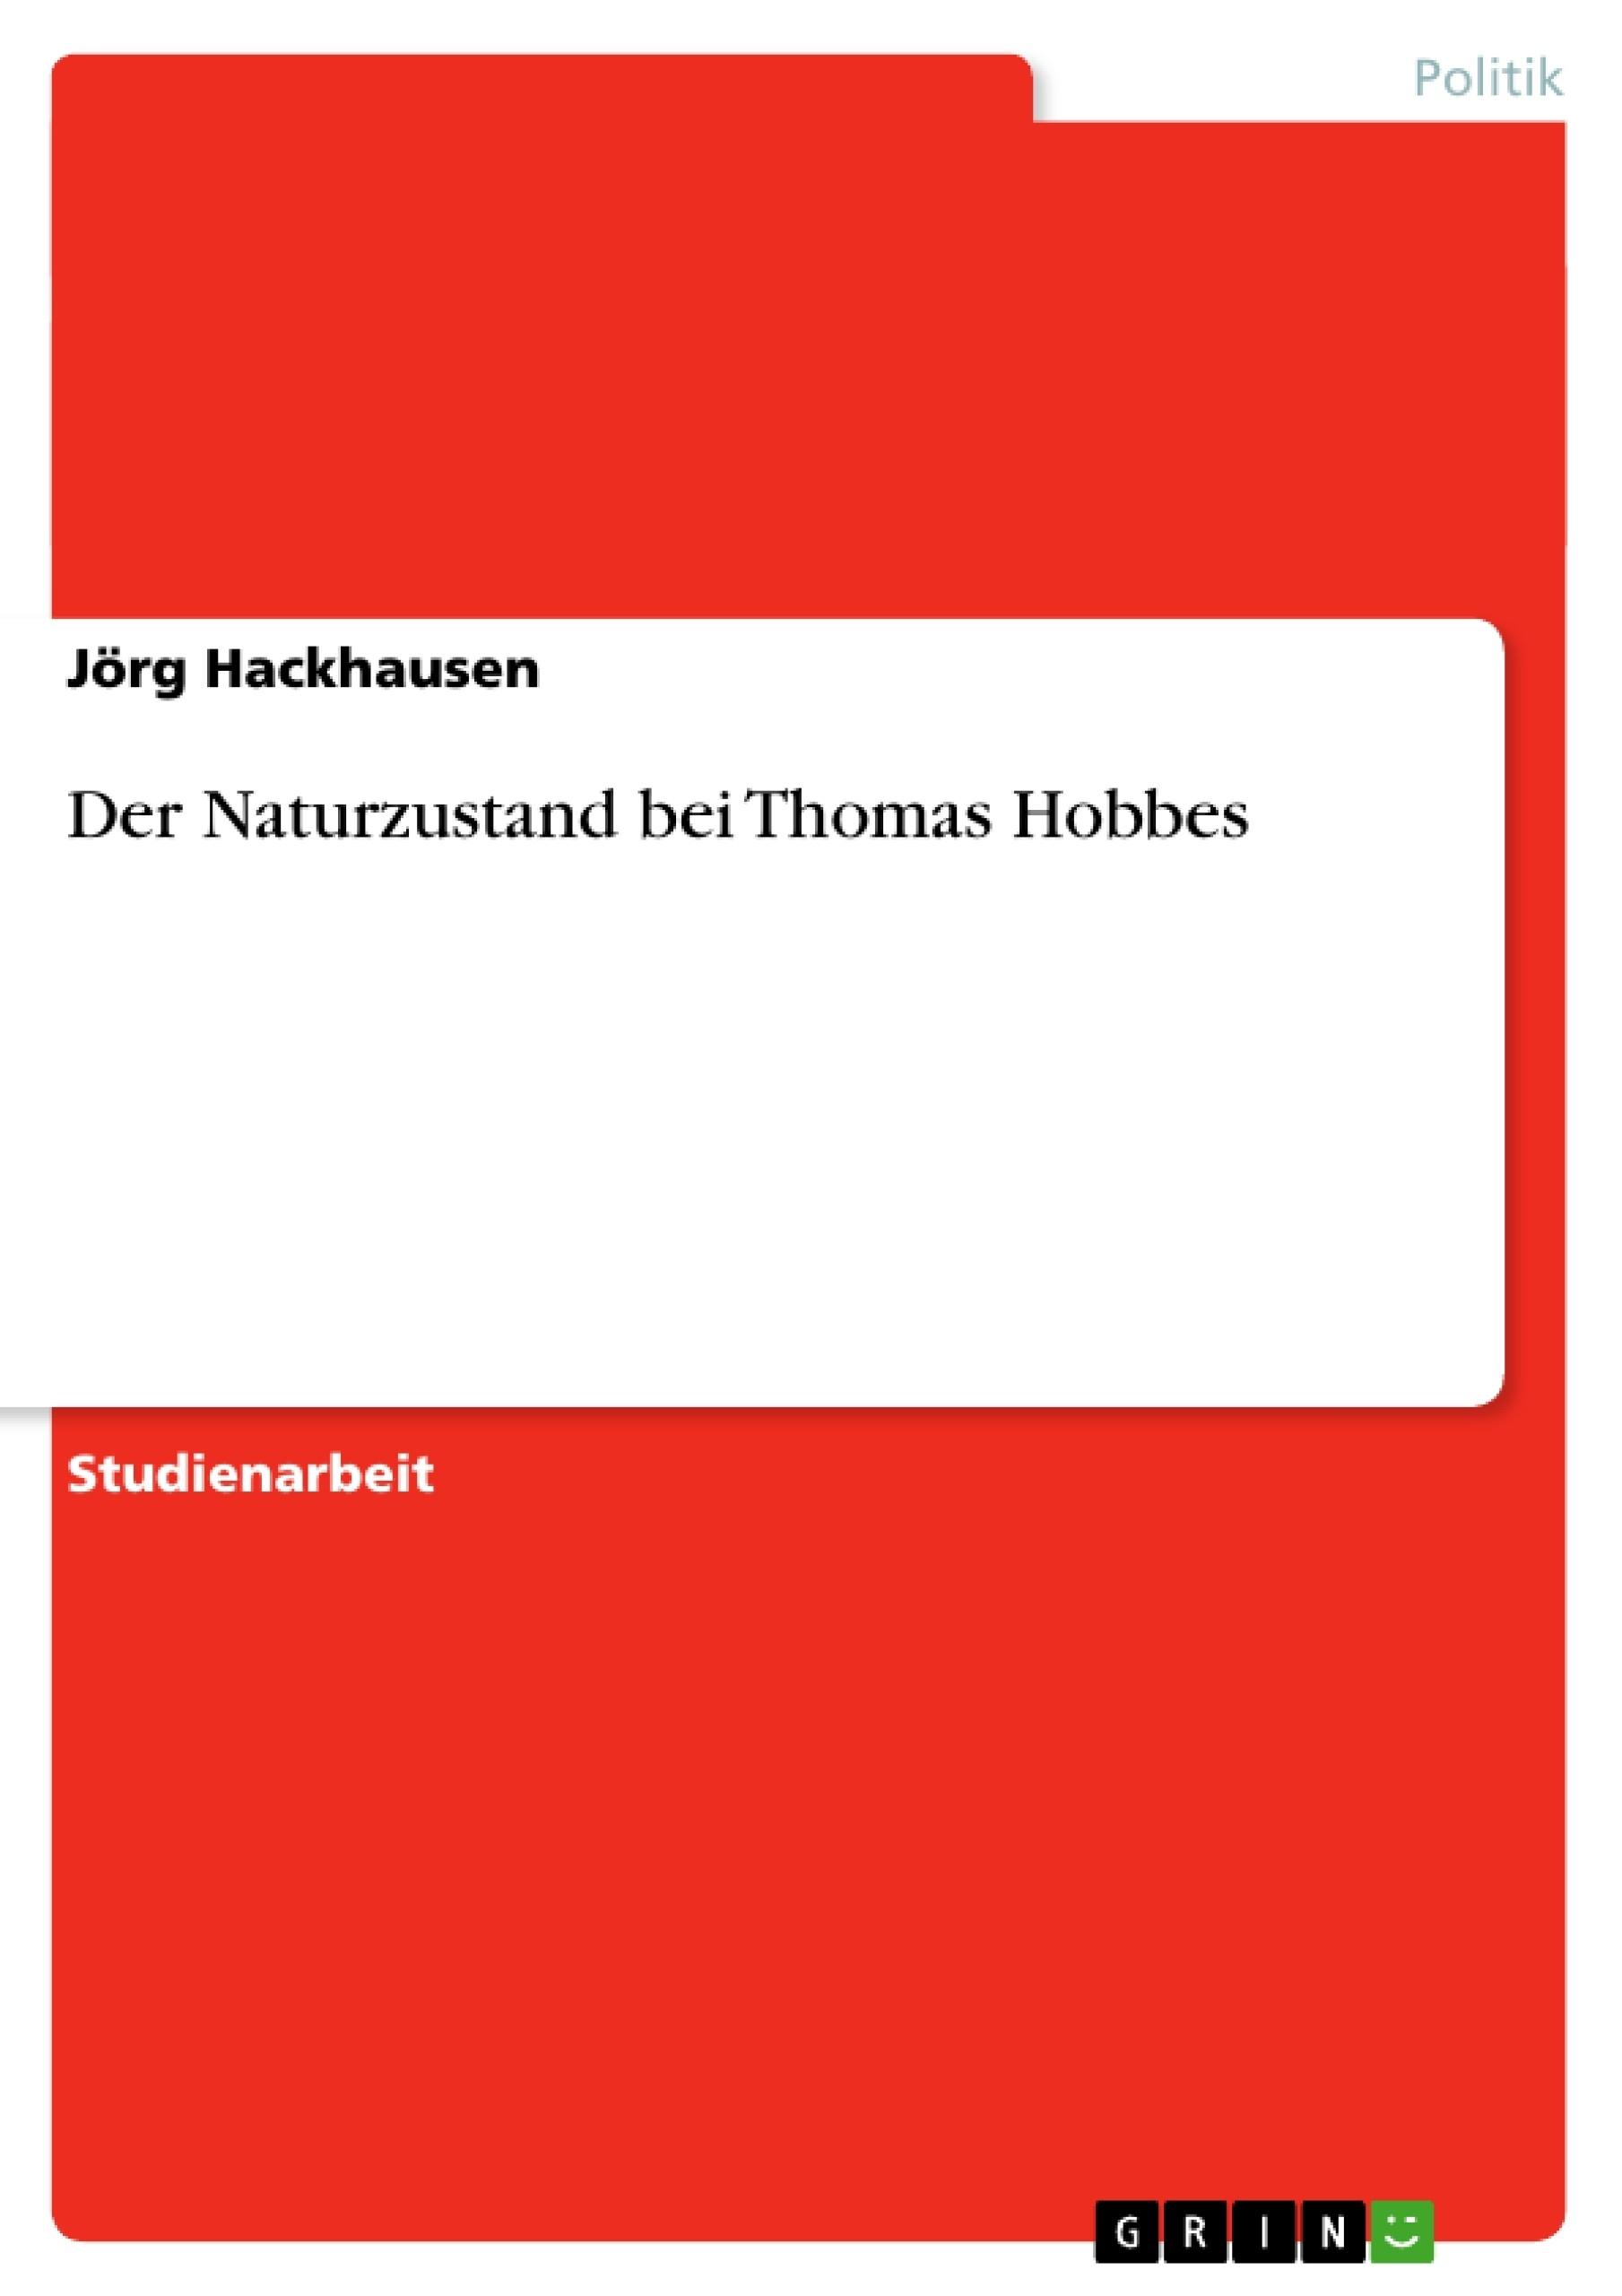 Titel: Der Naturzustand bei Thomas Hobbes